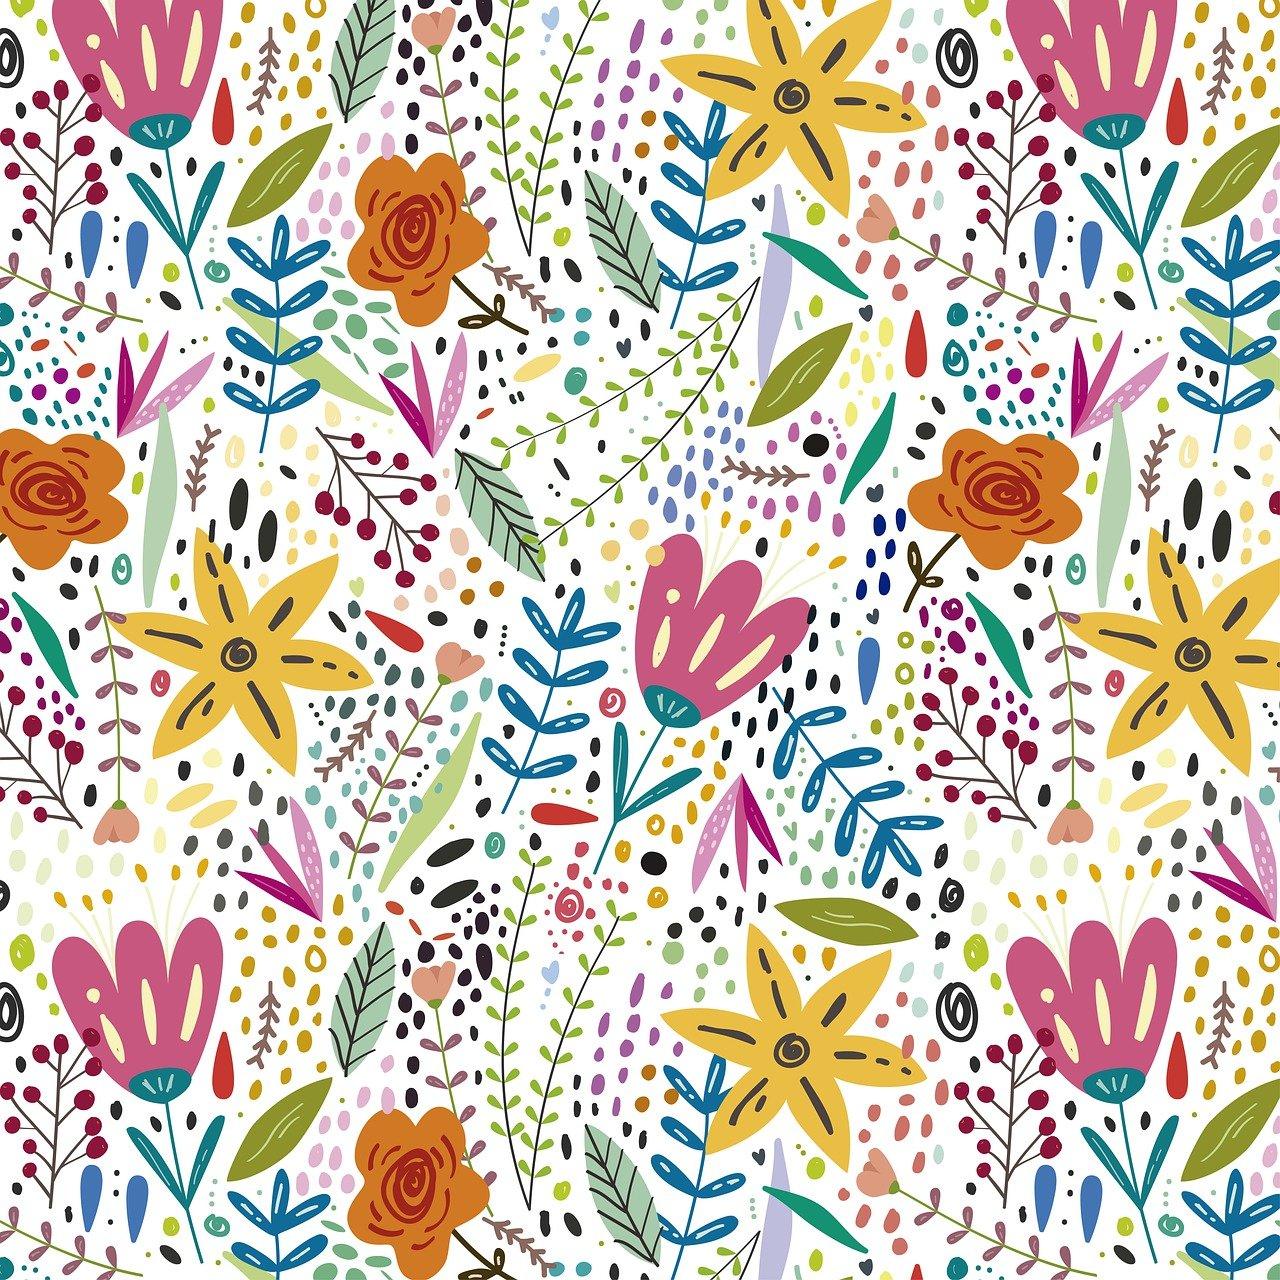 flowers, nature, wallpaper